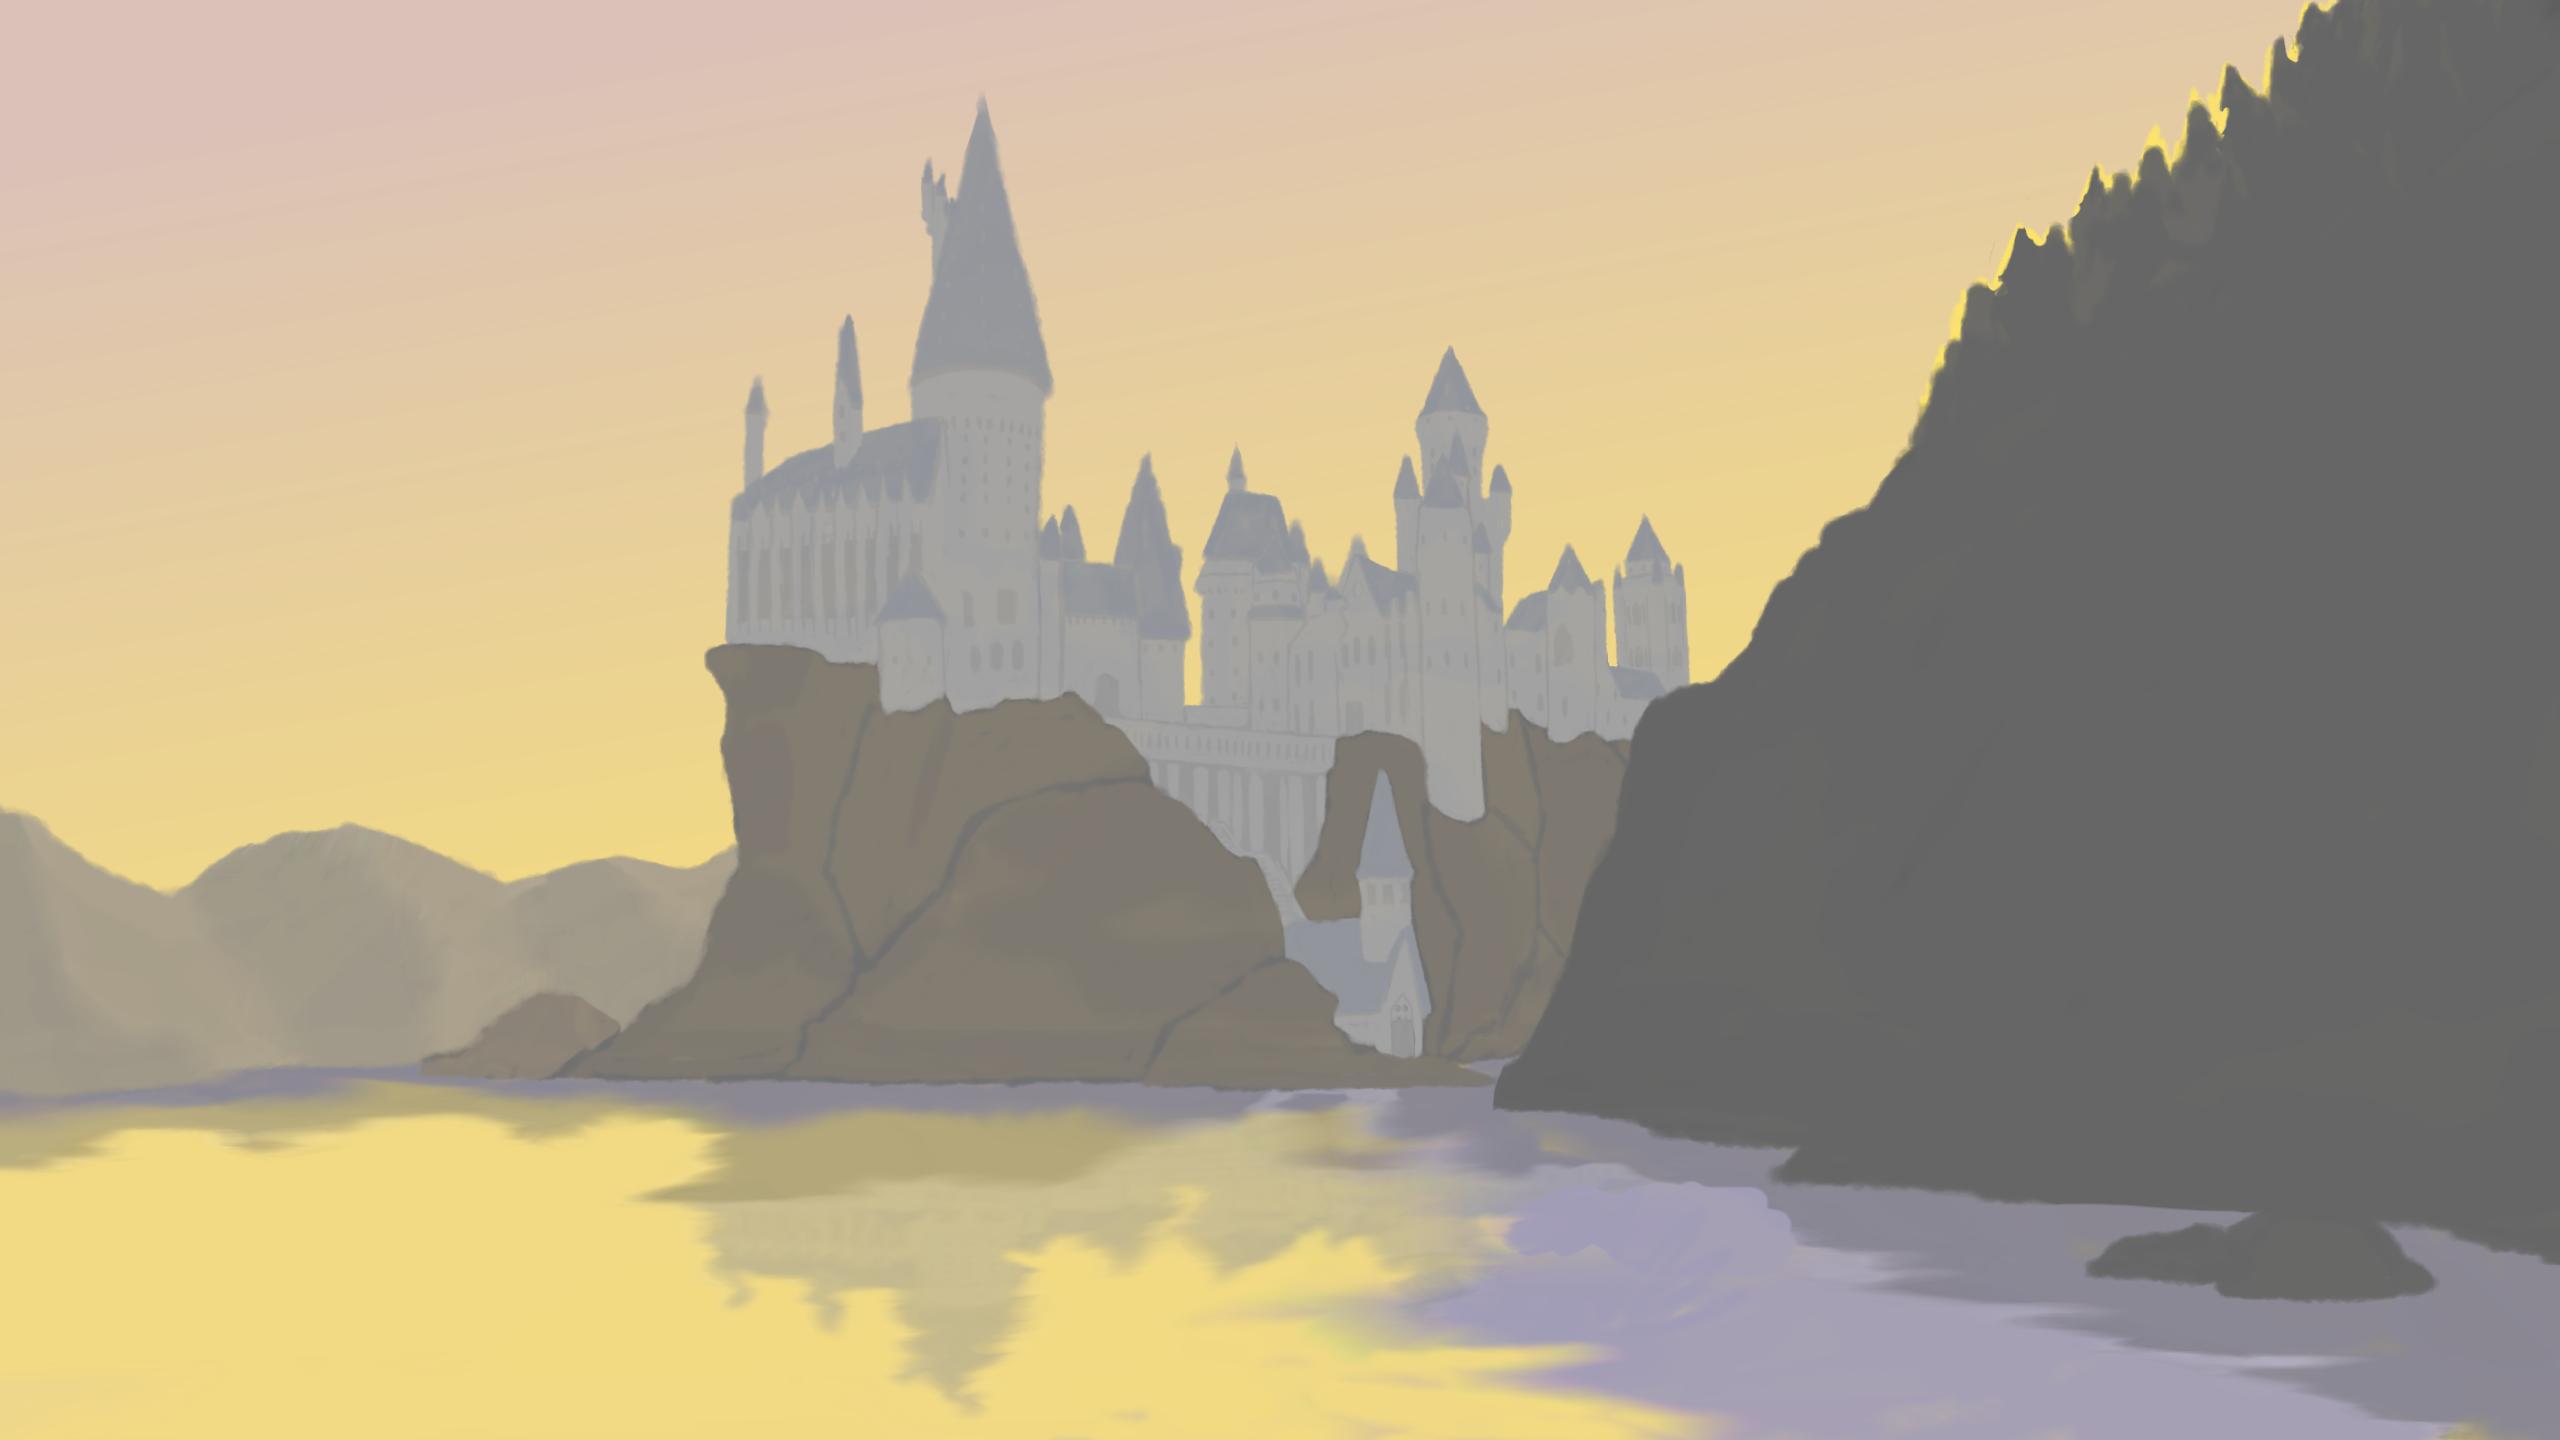 The Gates of Hogwarts (wip)